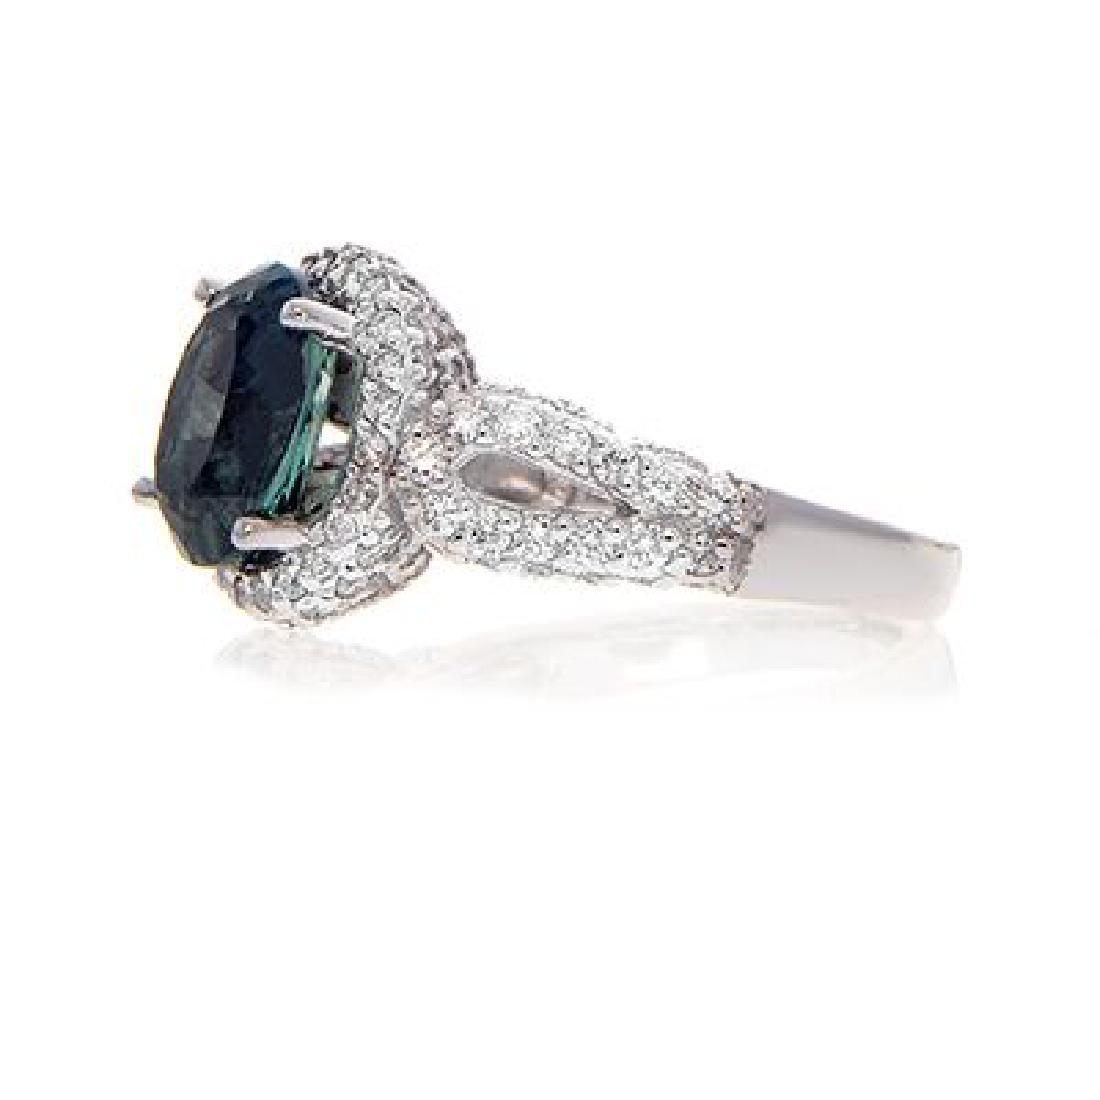 C.DUNAIGRE ALEXANDRITE RING WITH DIAMOND - 3